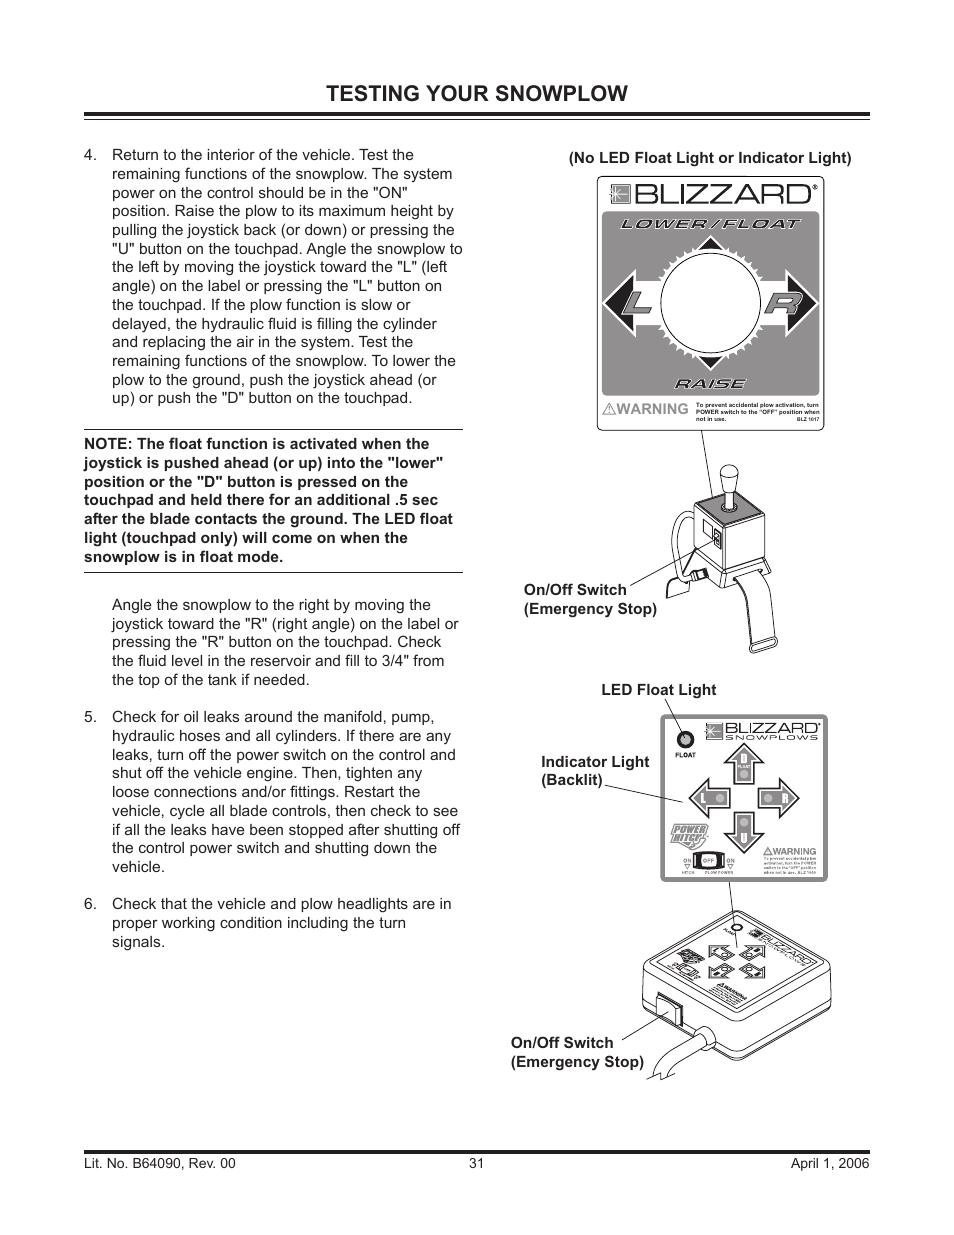 Testing Your Snowplow Blizzard Snowplows 760hd User Manual Page. Testing Your Snowplow Blizzard Snowplows 760hd User Manual Page 31 52. Wiring. Blizzard 760 Plow Wiring Diagram At Scoala.co